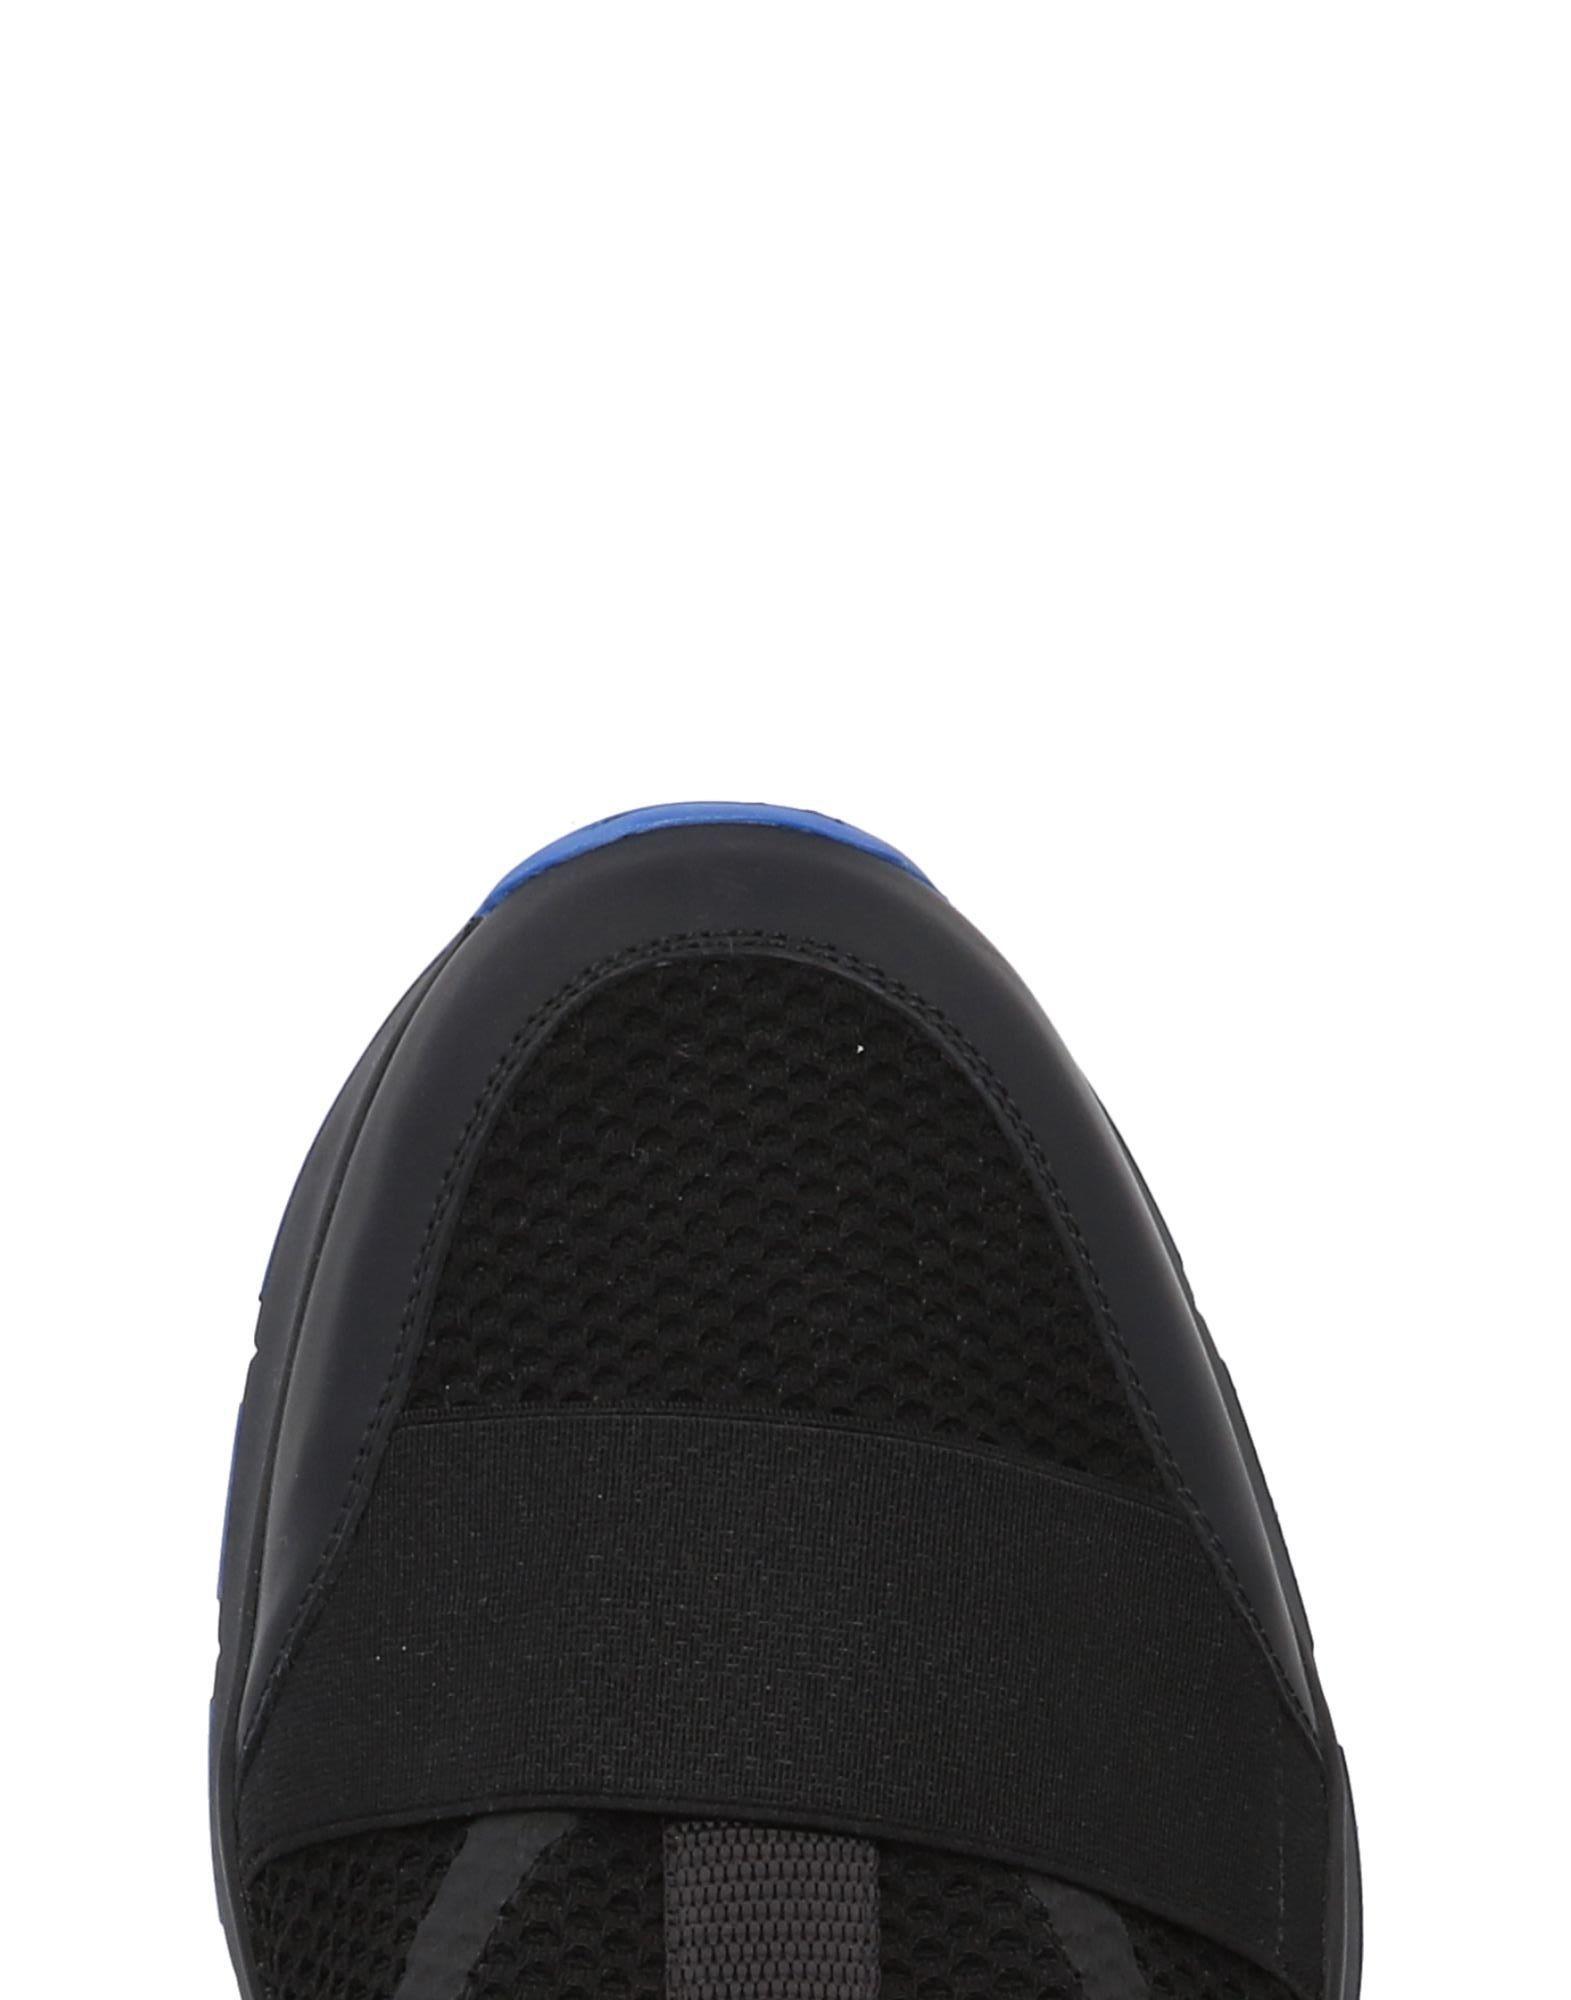 Dior Homme Sneakers Qualität Herren  11463209MJ Gute Qualität Sneakers beliebte Schuhe 4505bb